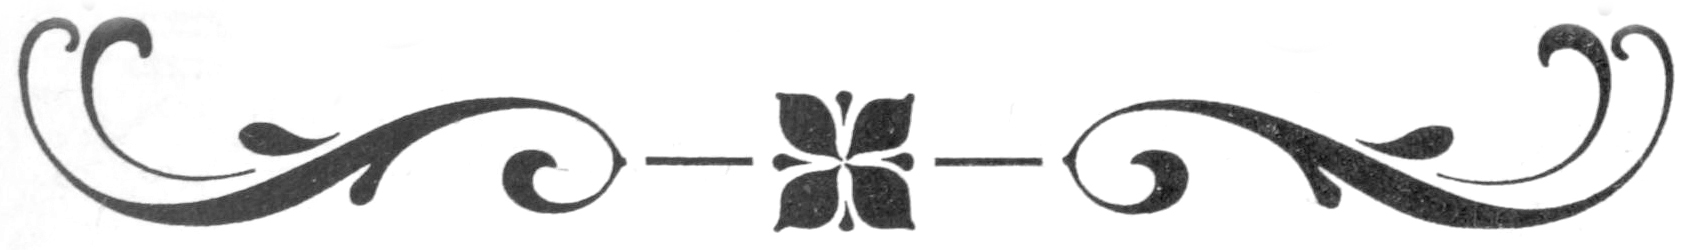 motiftypo-horizontal01